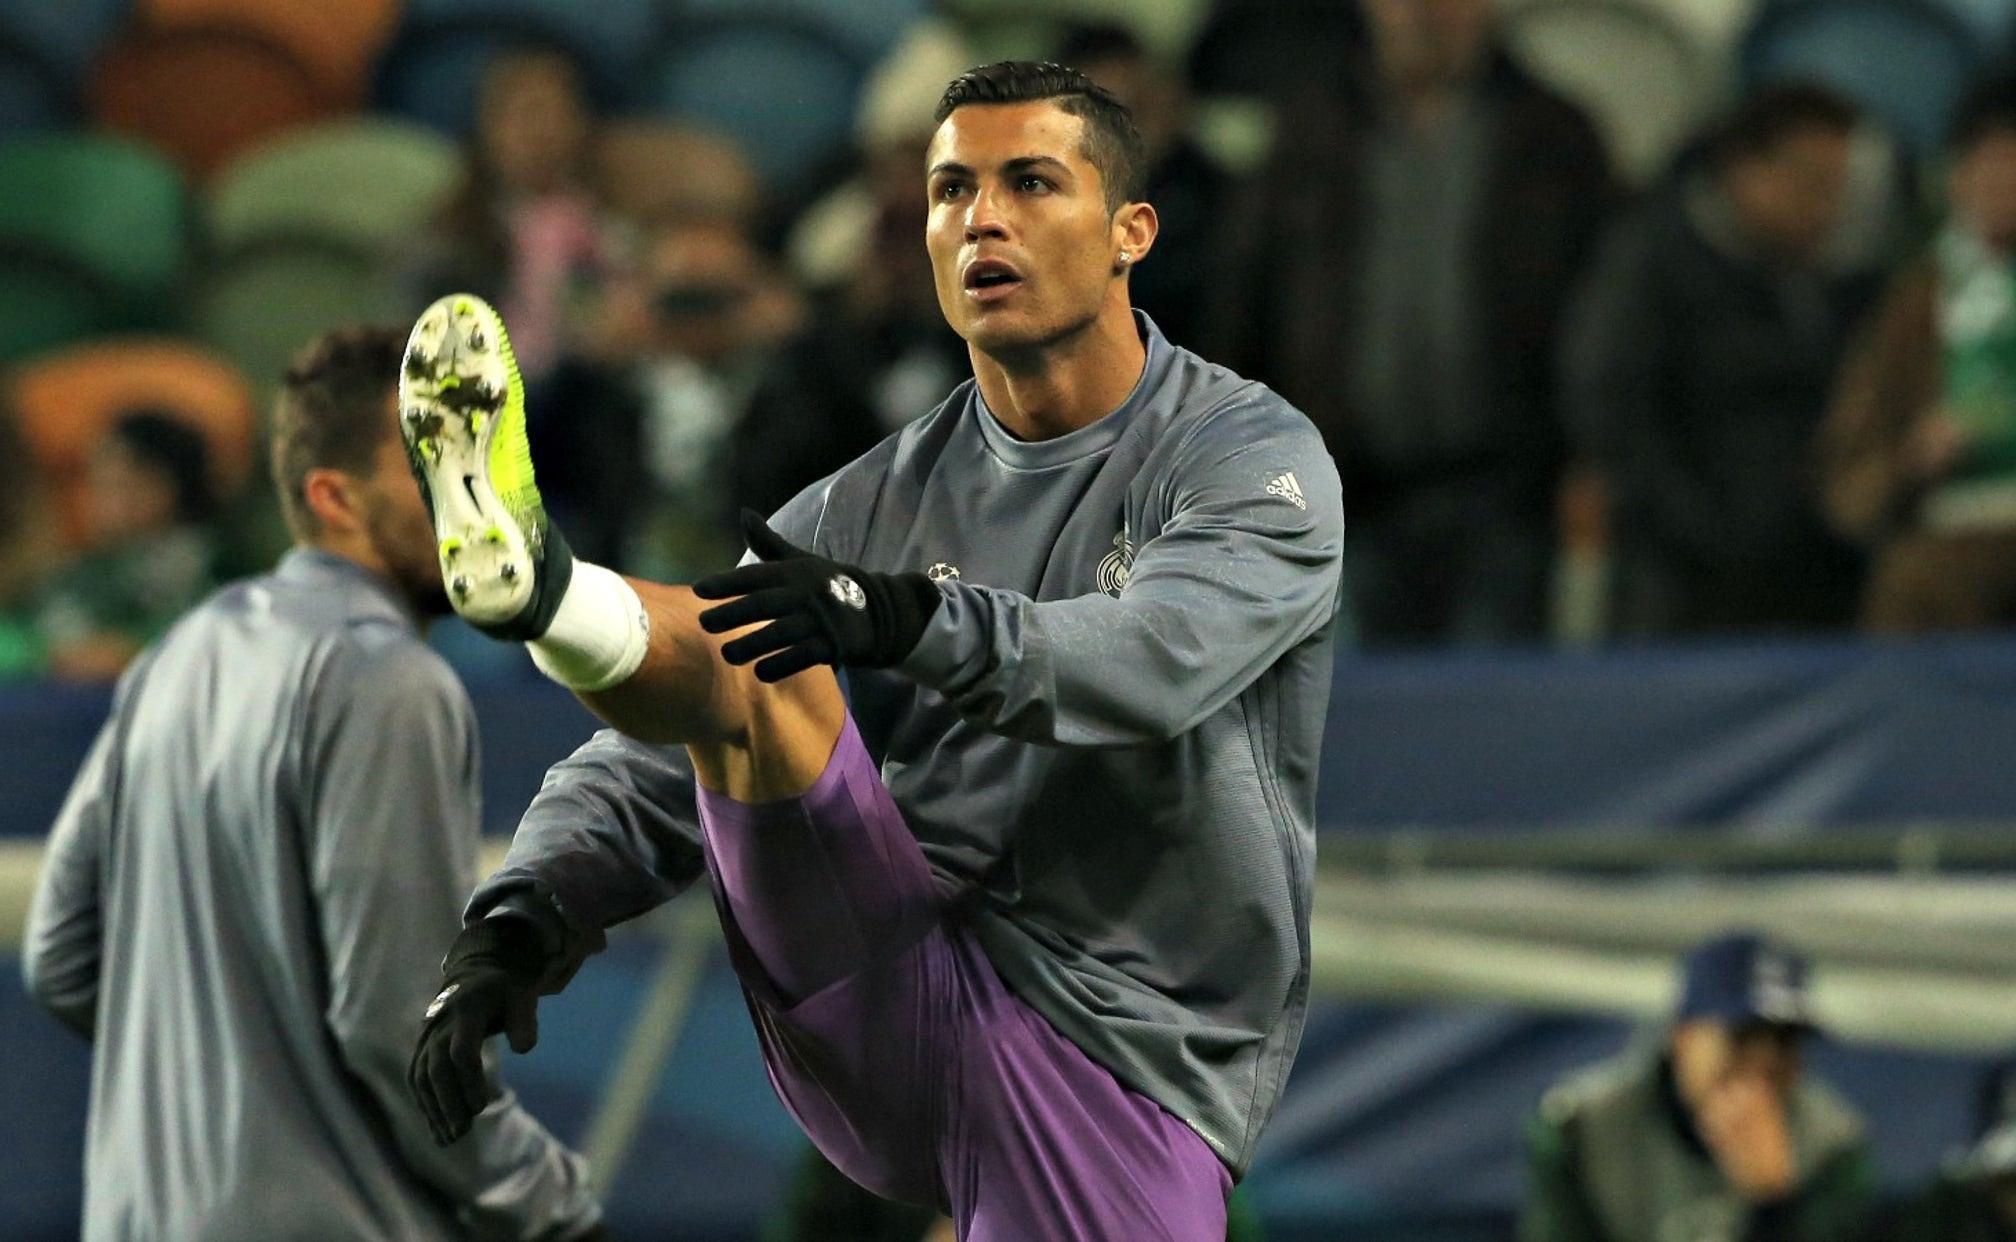 Cristiano Ronaldo Posts Video Of Bizarre Leg Workout On Instagram Fox Sports